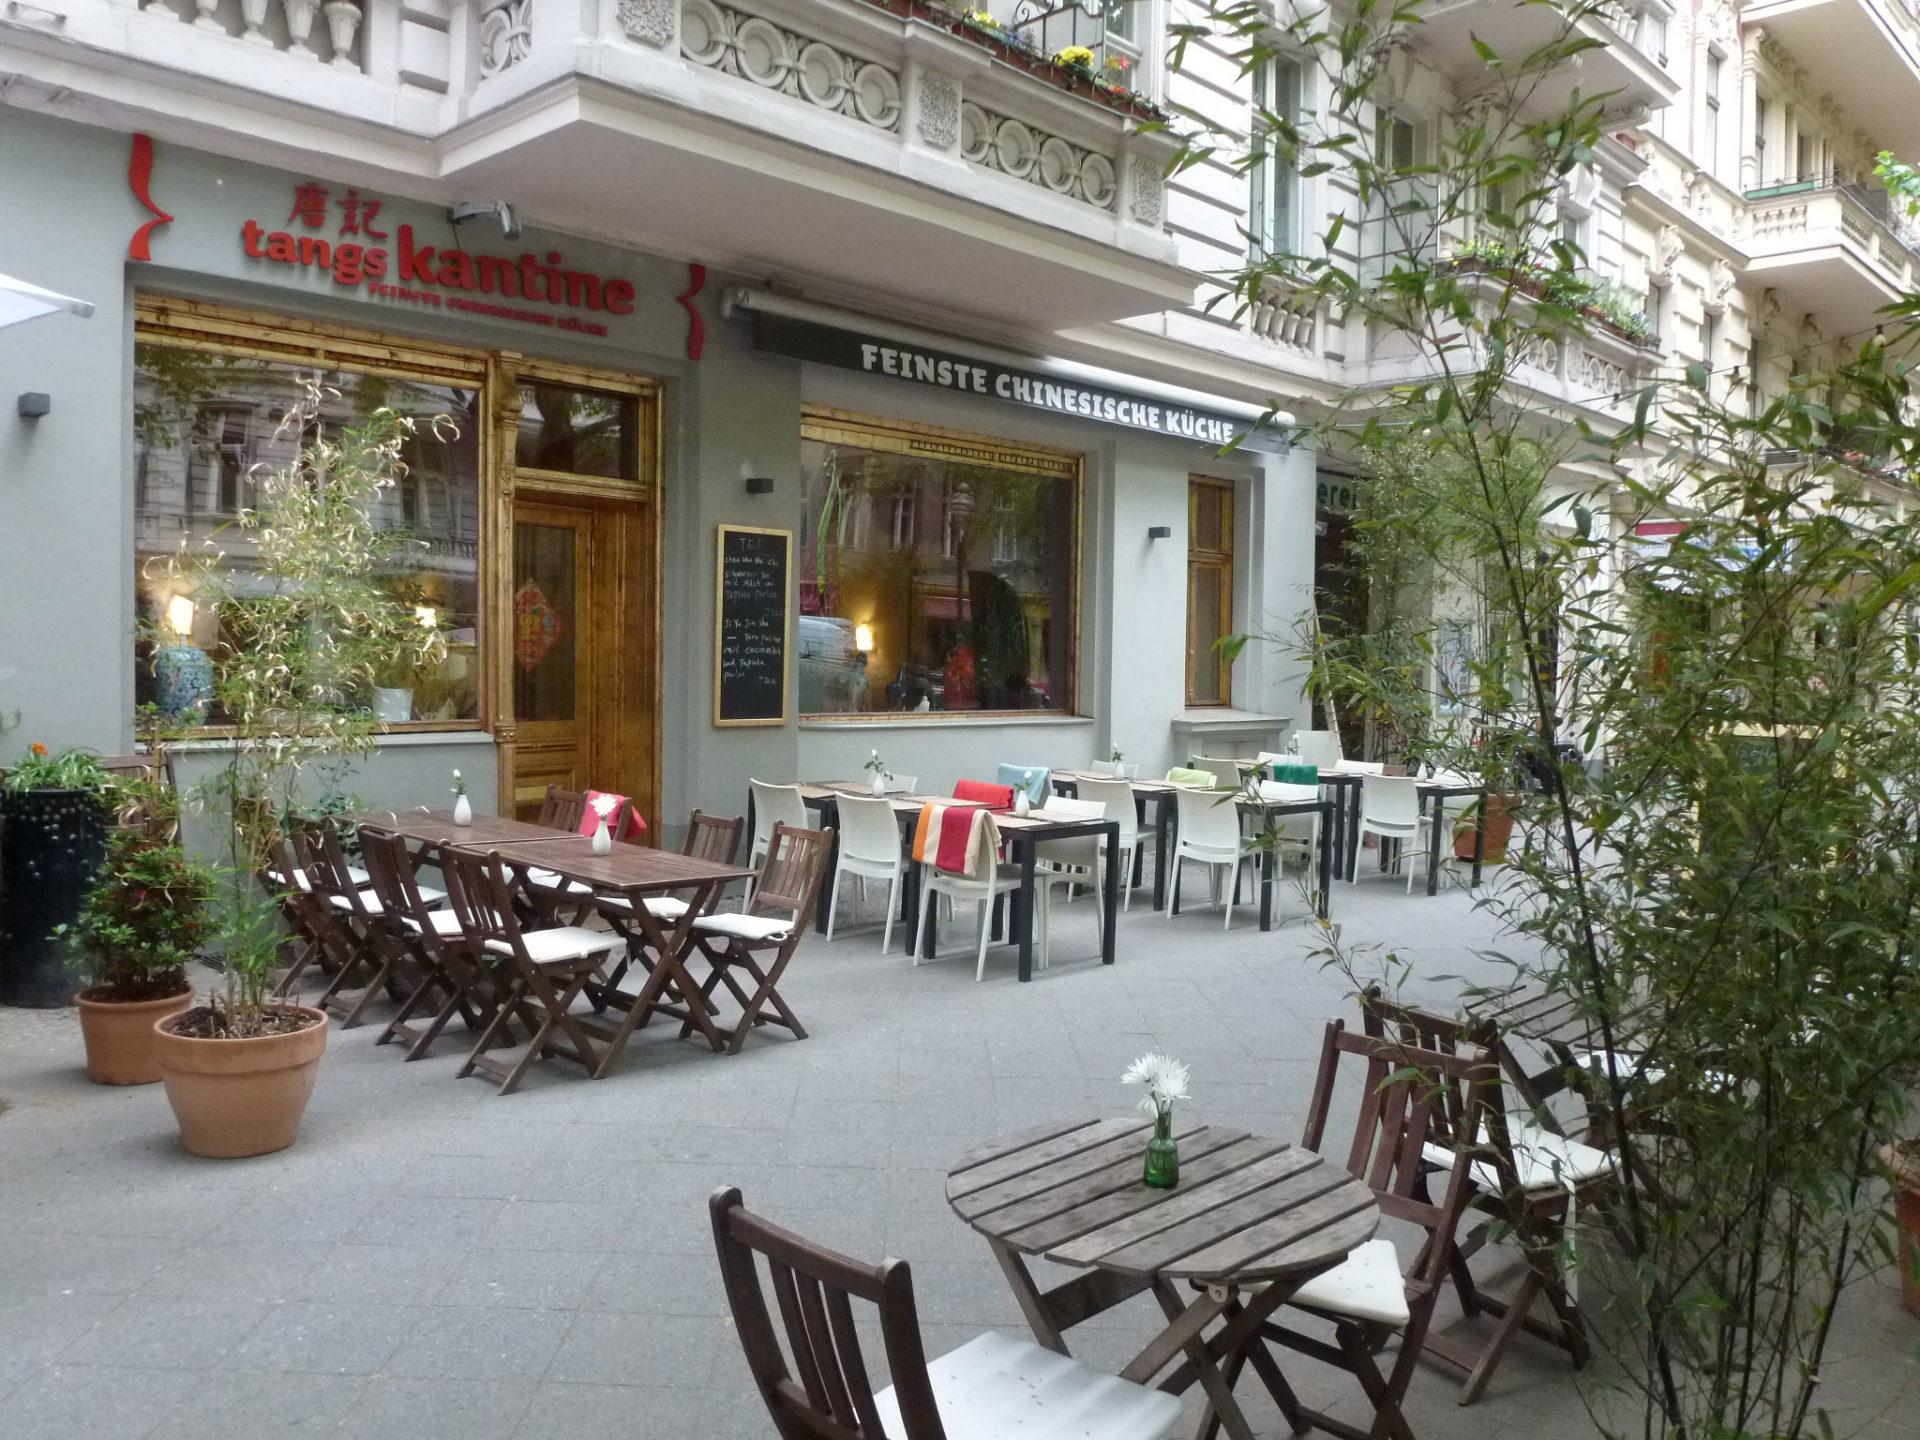 tangs kantine authentisches chinesisches restaurant in berlin kreuzberg. Black Bedroom Furniture Sets. Home Design Ideas